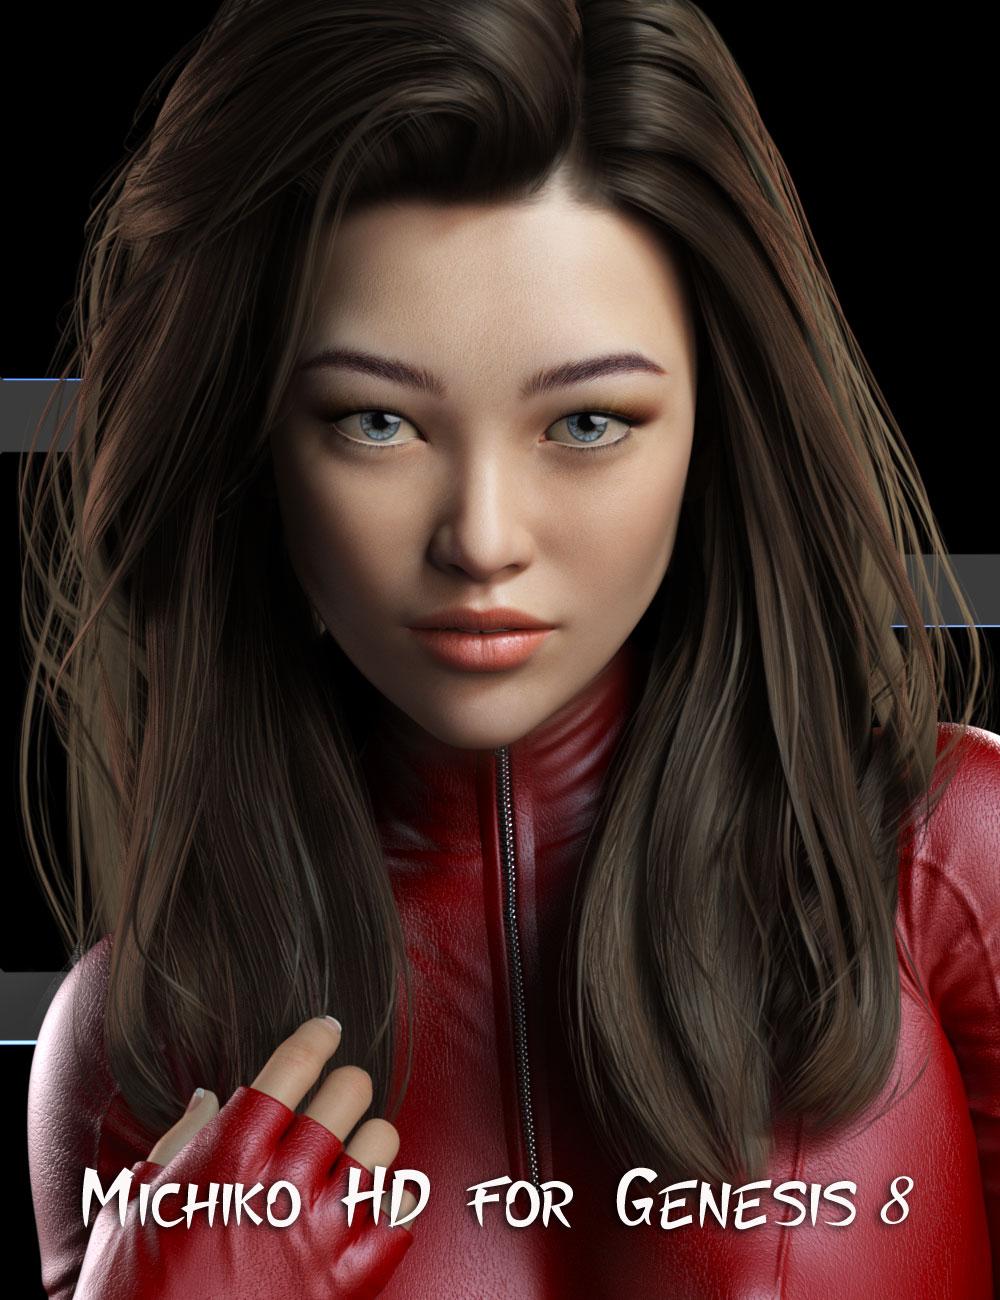 Michiko HD for Genesis 8 Female by: Mousso, 3D Models by Daz 3D